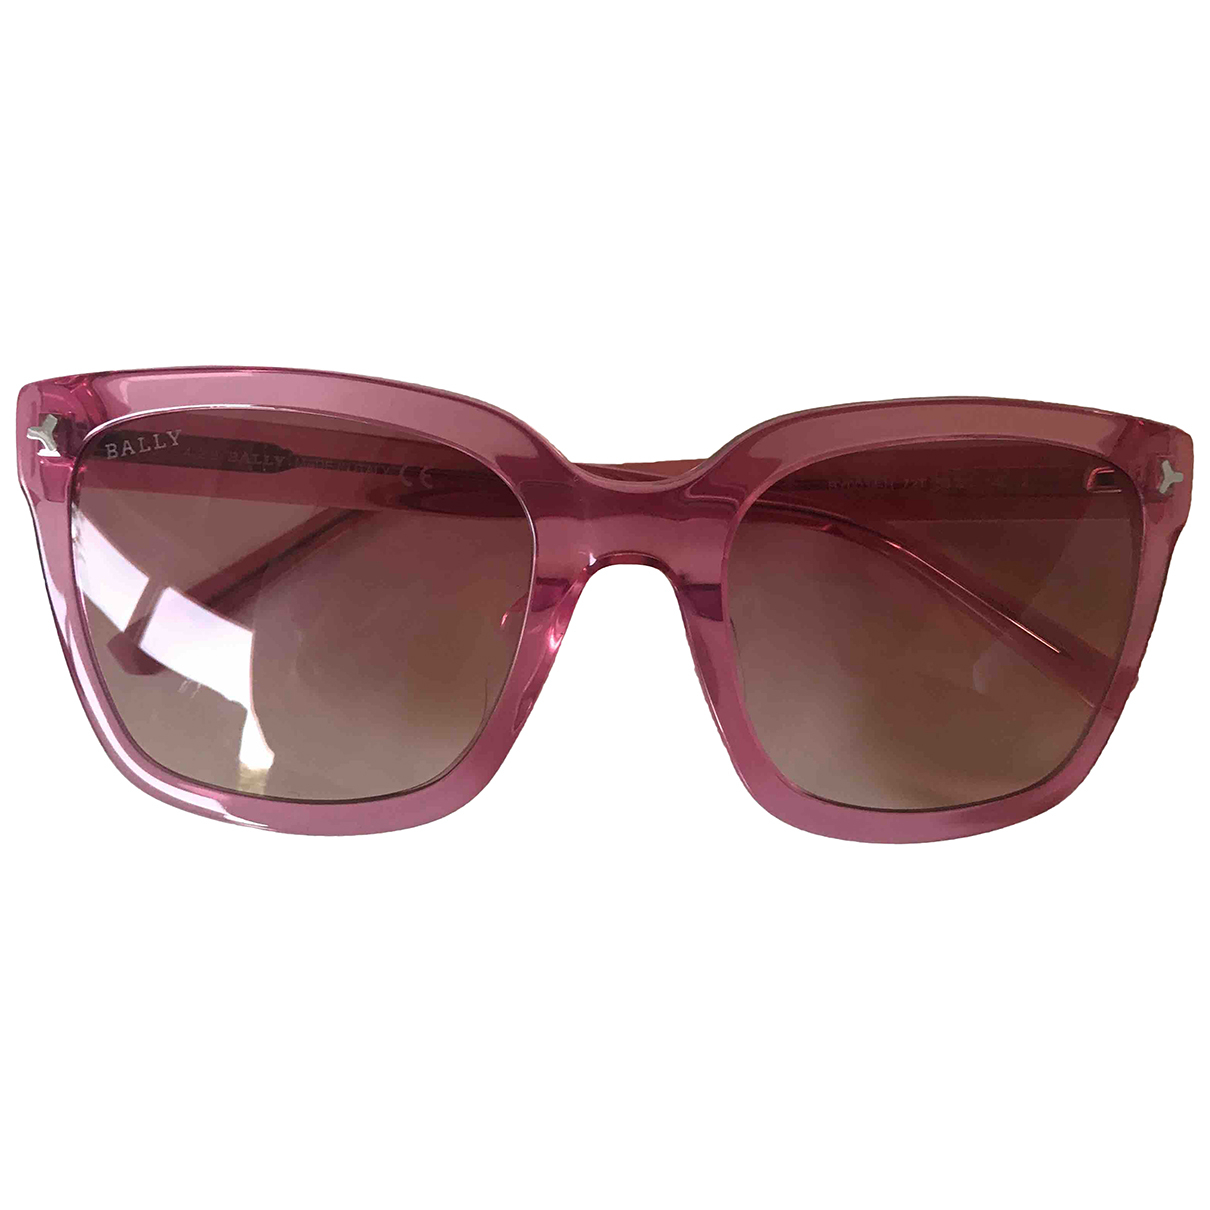 Bally - Lunettes   pour femme - rose